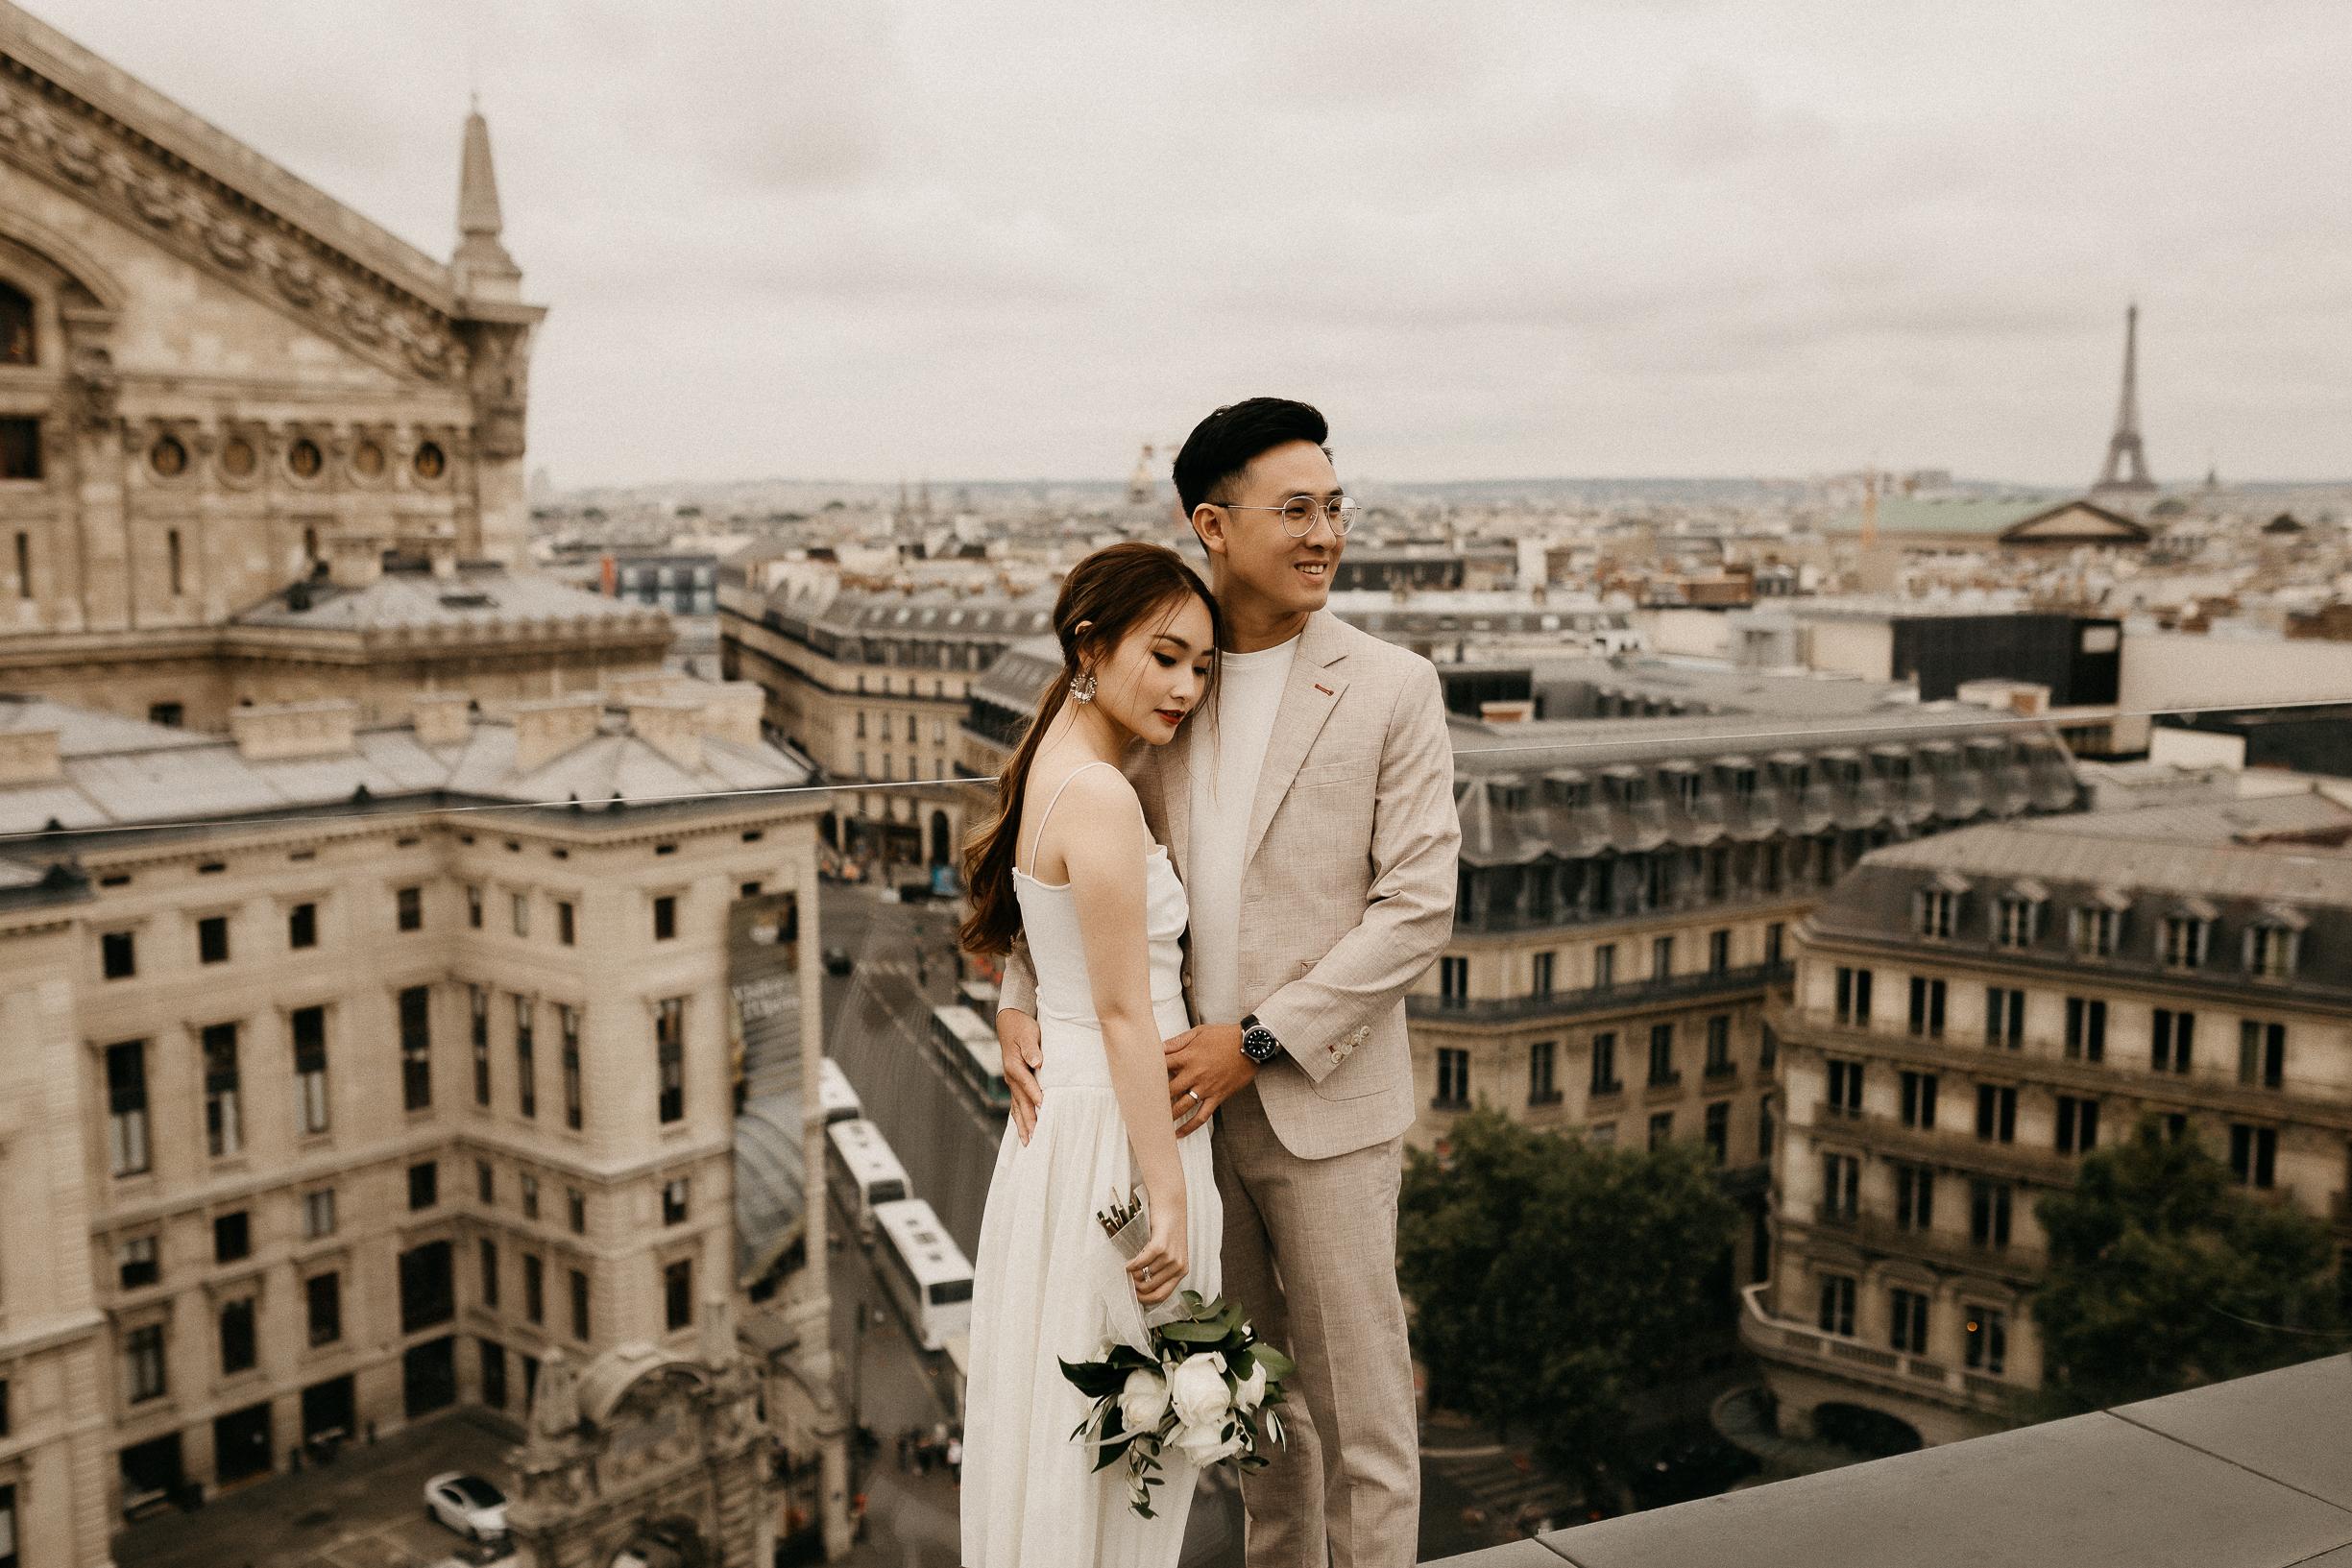 Paris rooftop eiffel tower view wedding photo